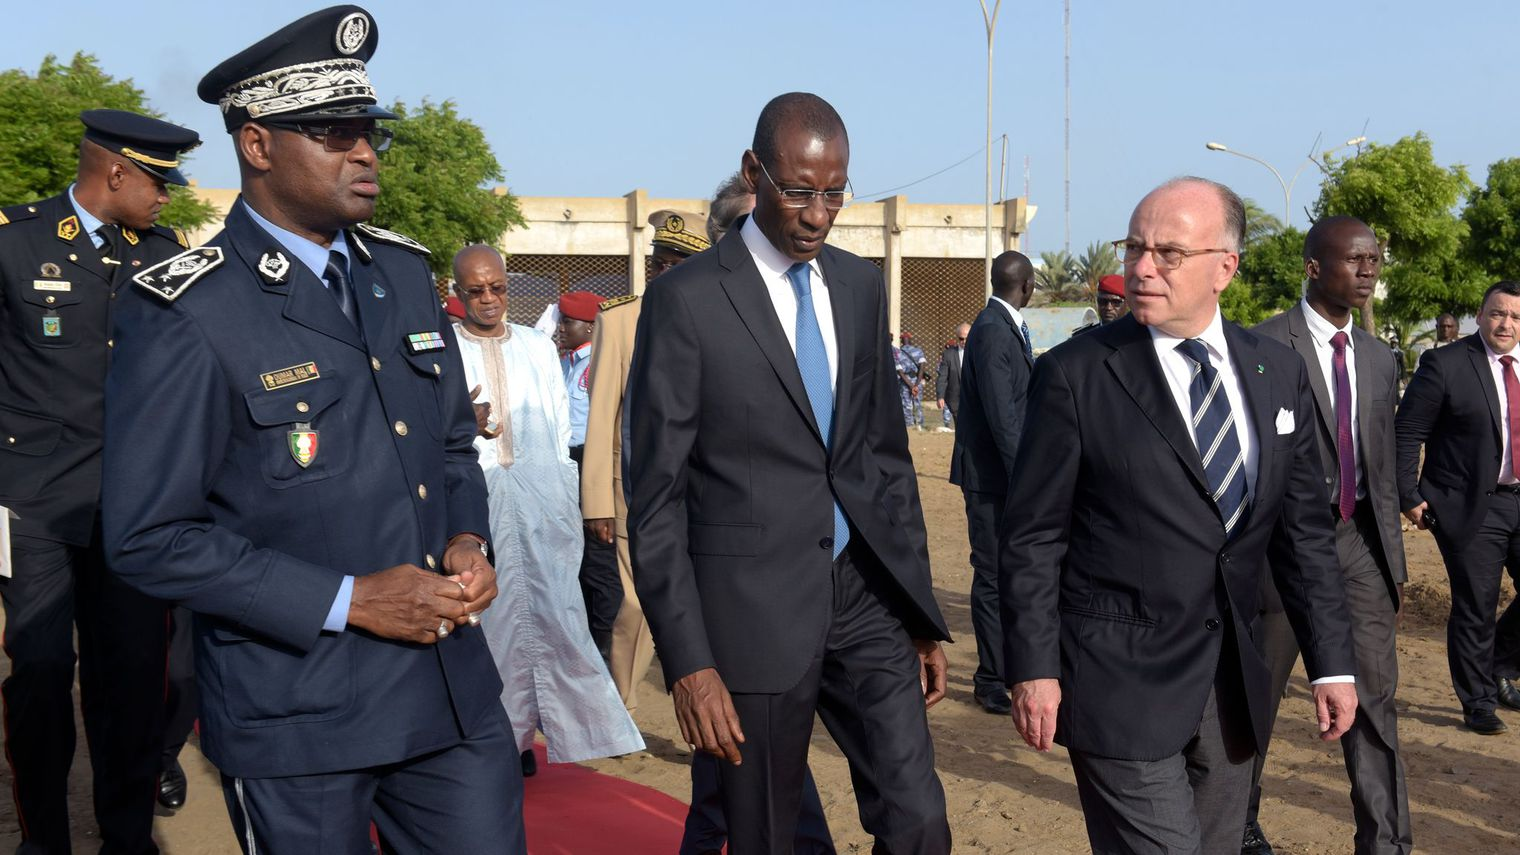 les-ministres-francais-et-senegalais-de-l-interieur-bernard-cazeneuve-et-abdoulaye-daouda-diallo-c-le-7-octobre-2016-a-dakar_5722183